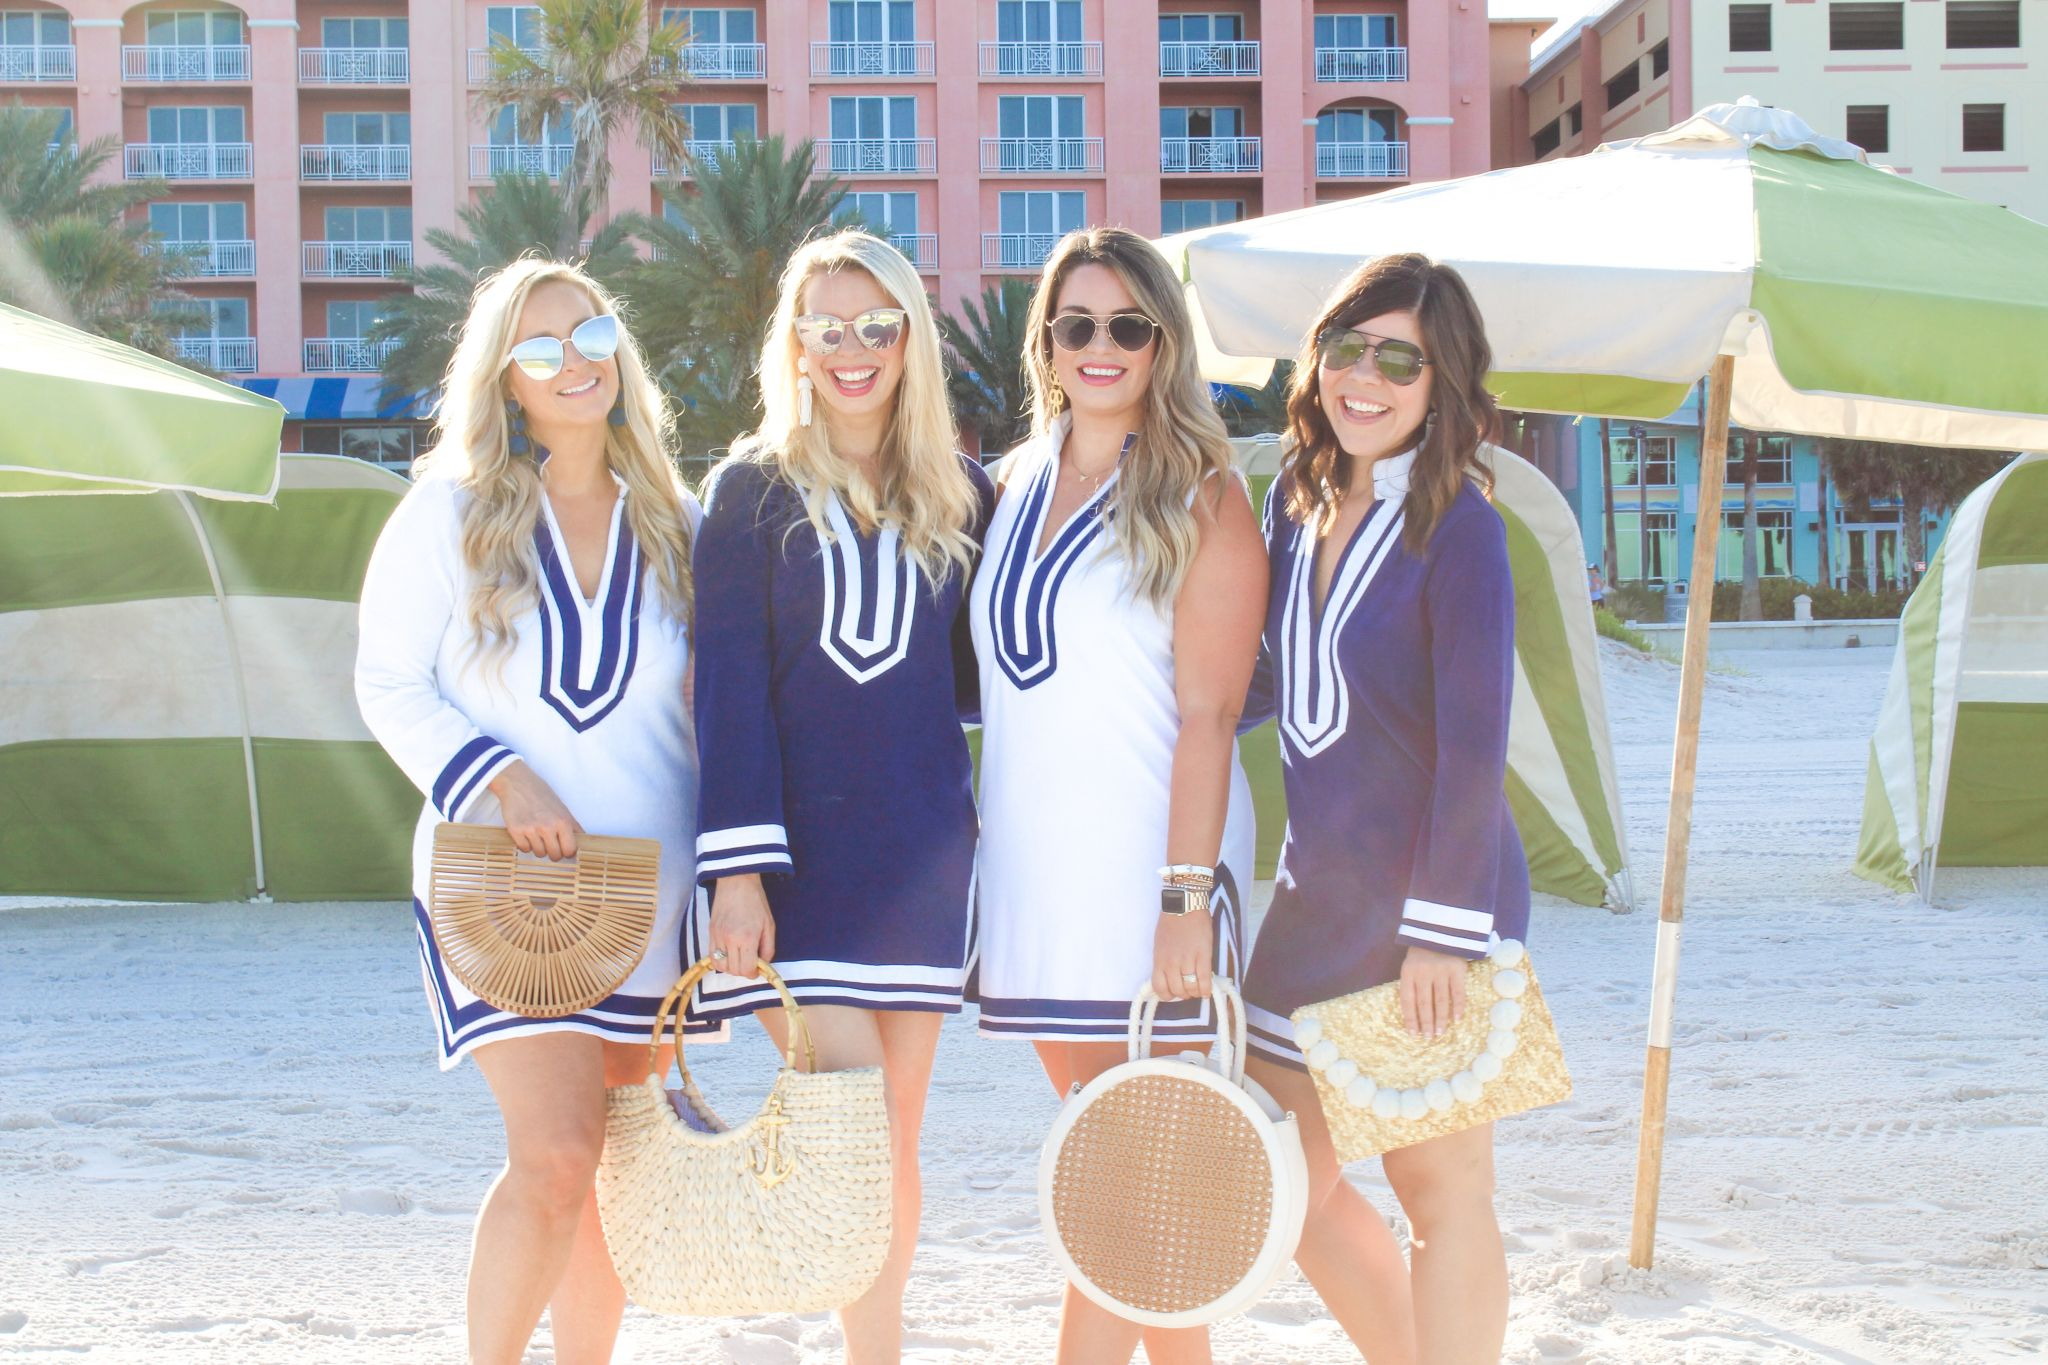 Cabana Life x Hyatt Regency Weekend Getaway!